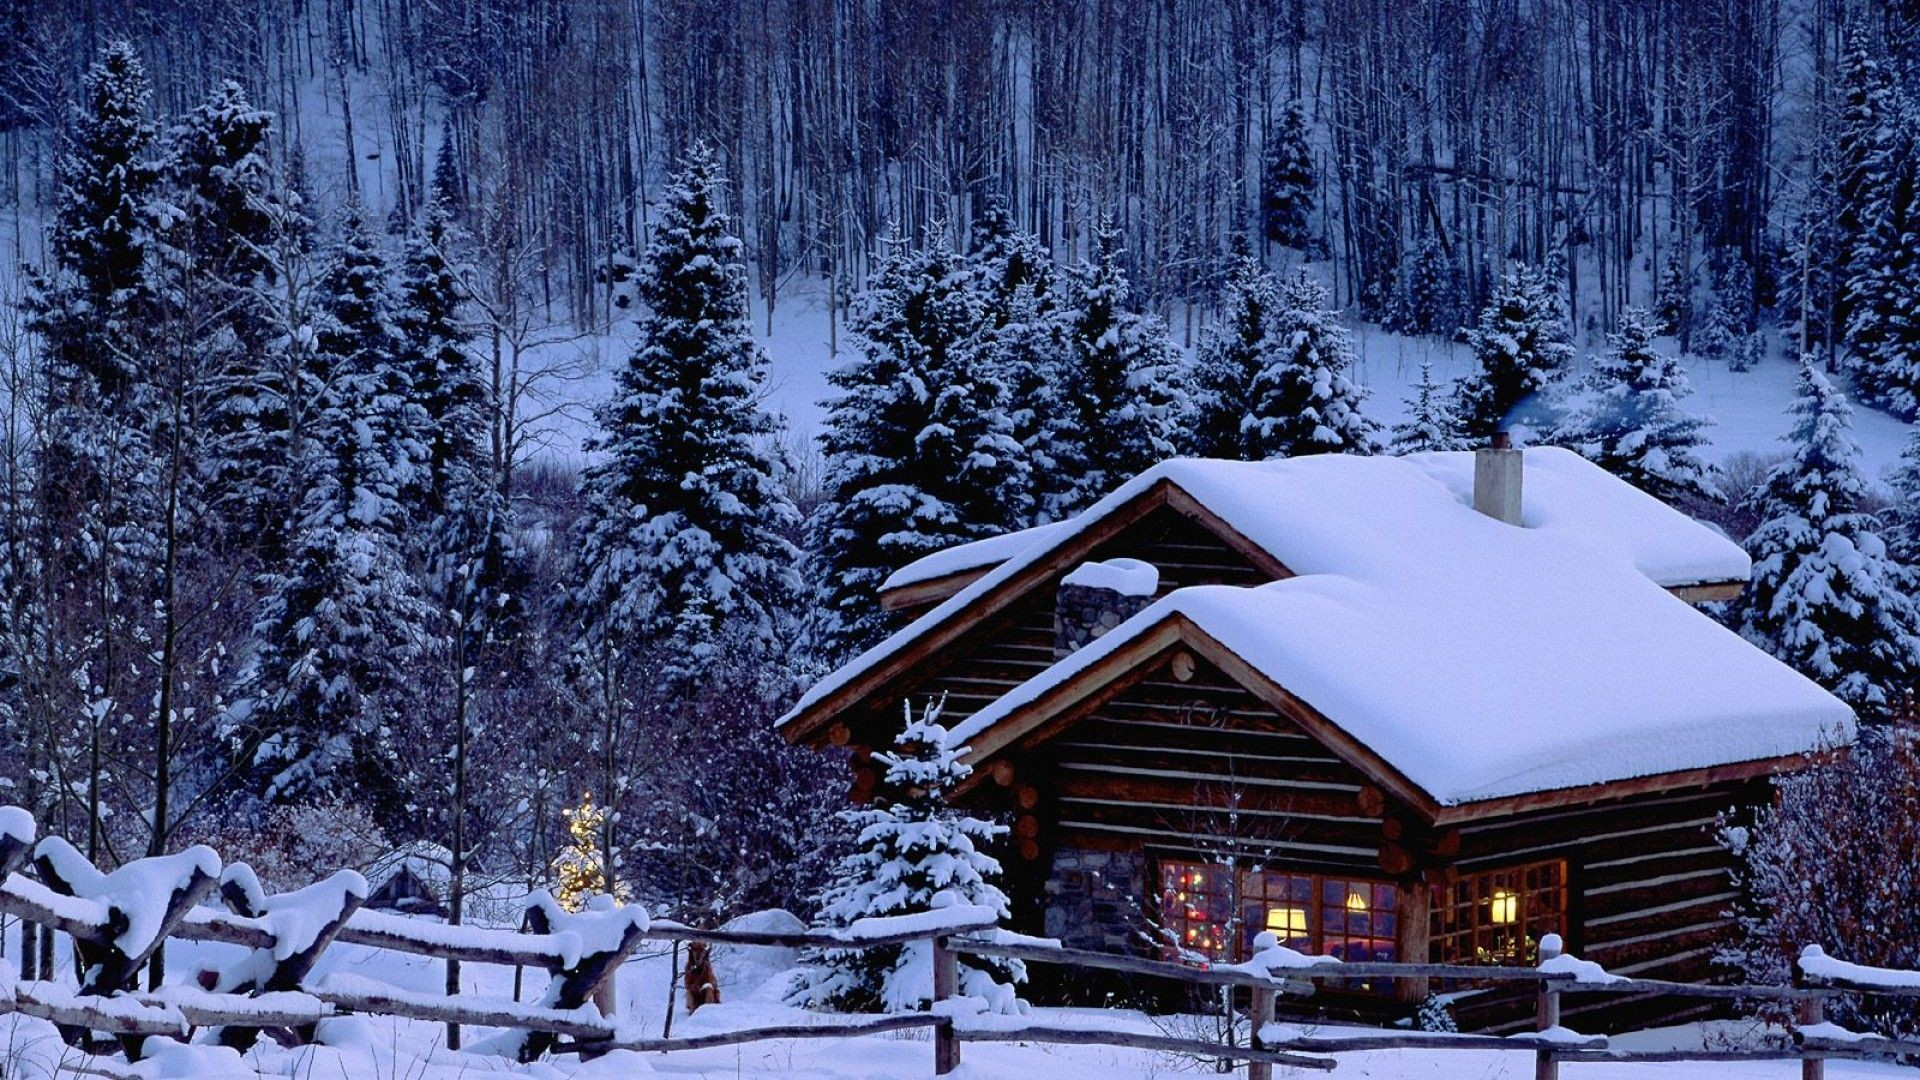 Christmas-Wallpapers-Hd-Widescreen-1.jpg